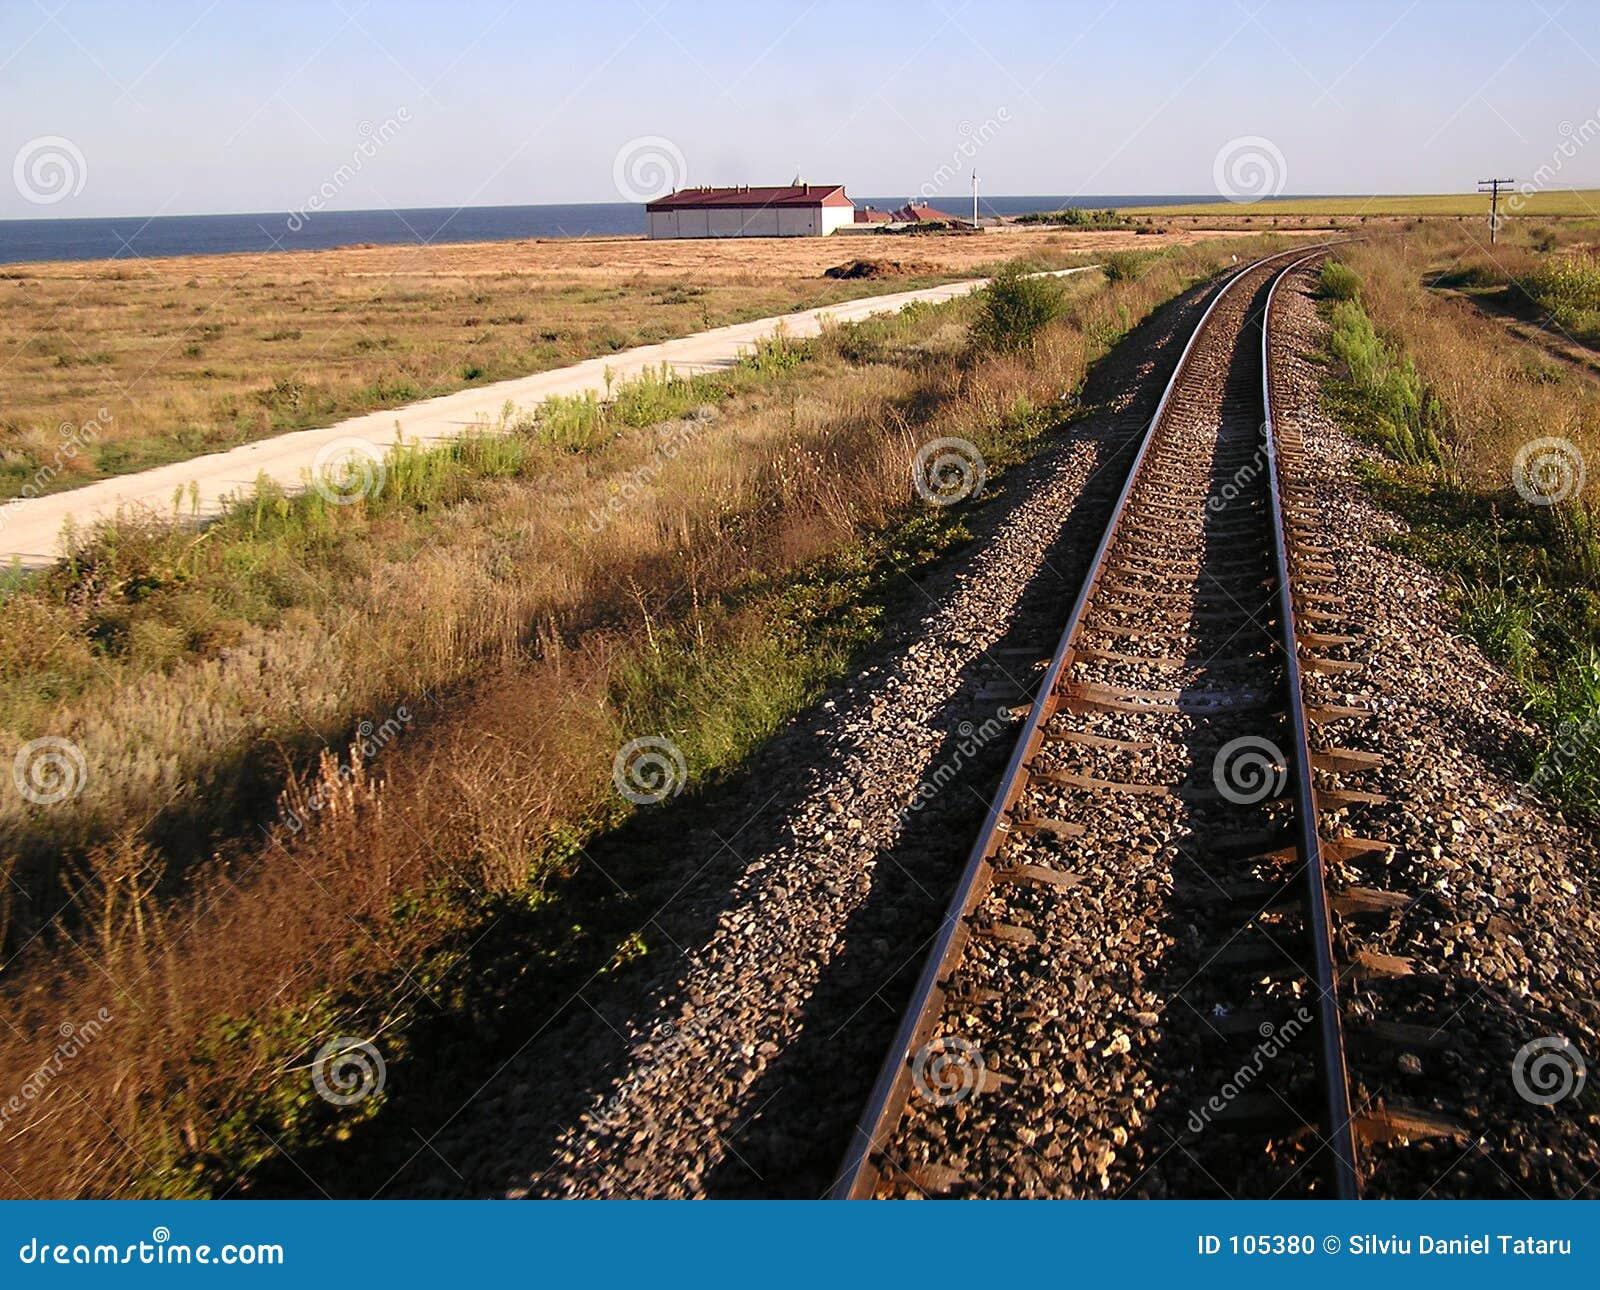 Railway on the sea shore